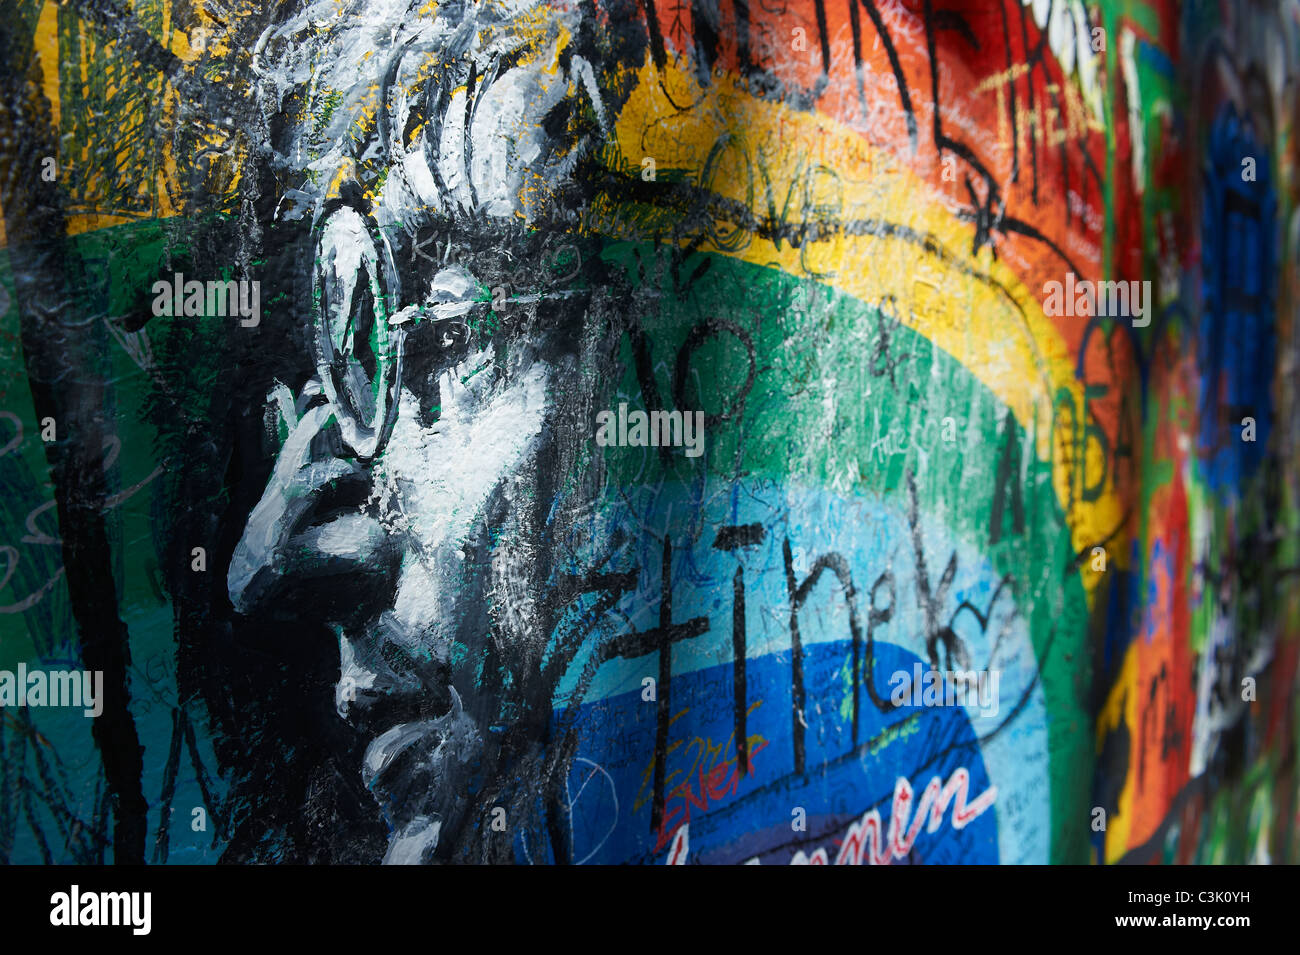 The John Lennon graffiti Wall in Prague, Czech Republic Stock Photo